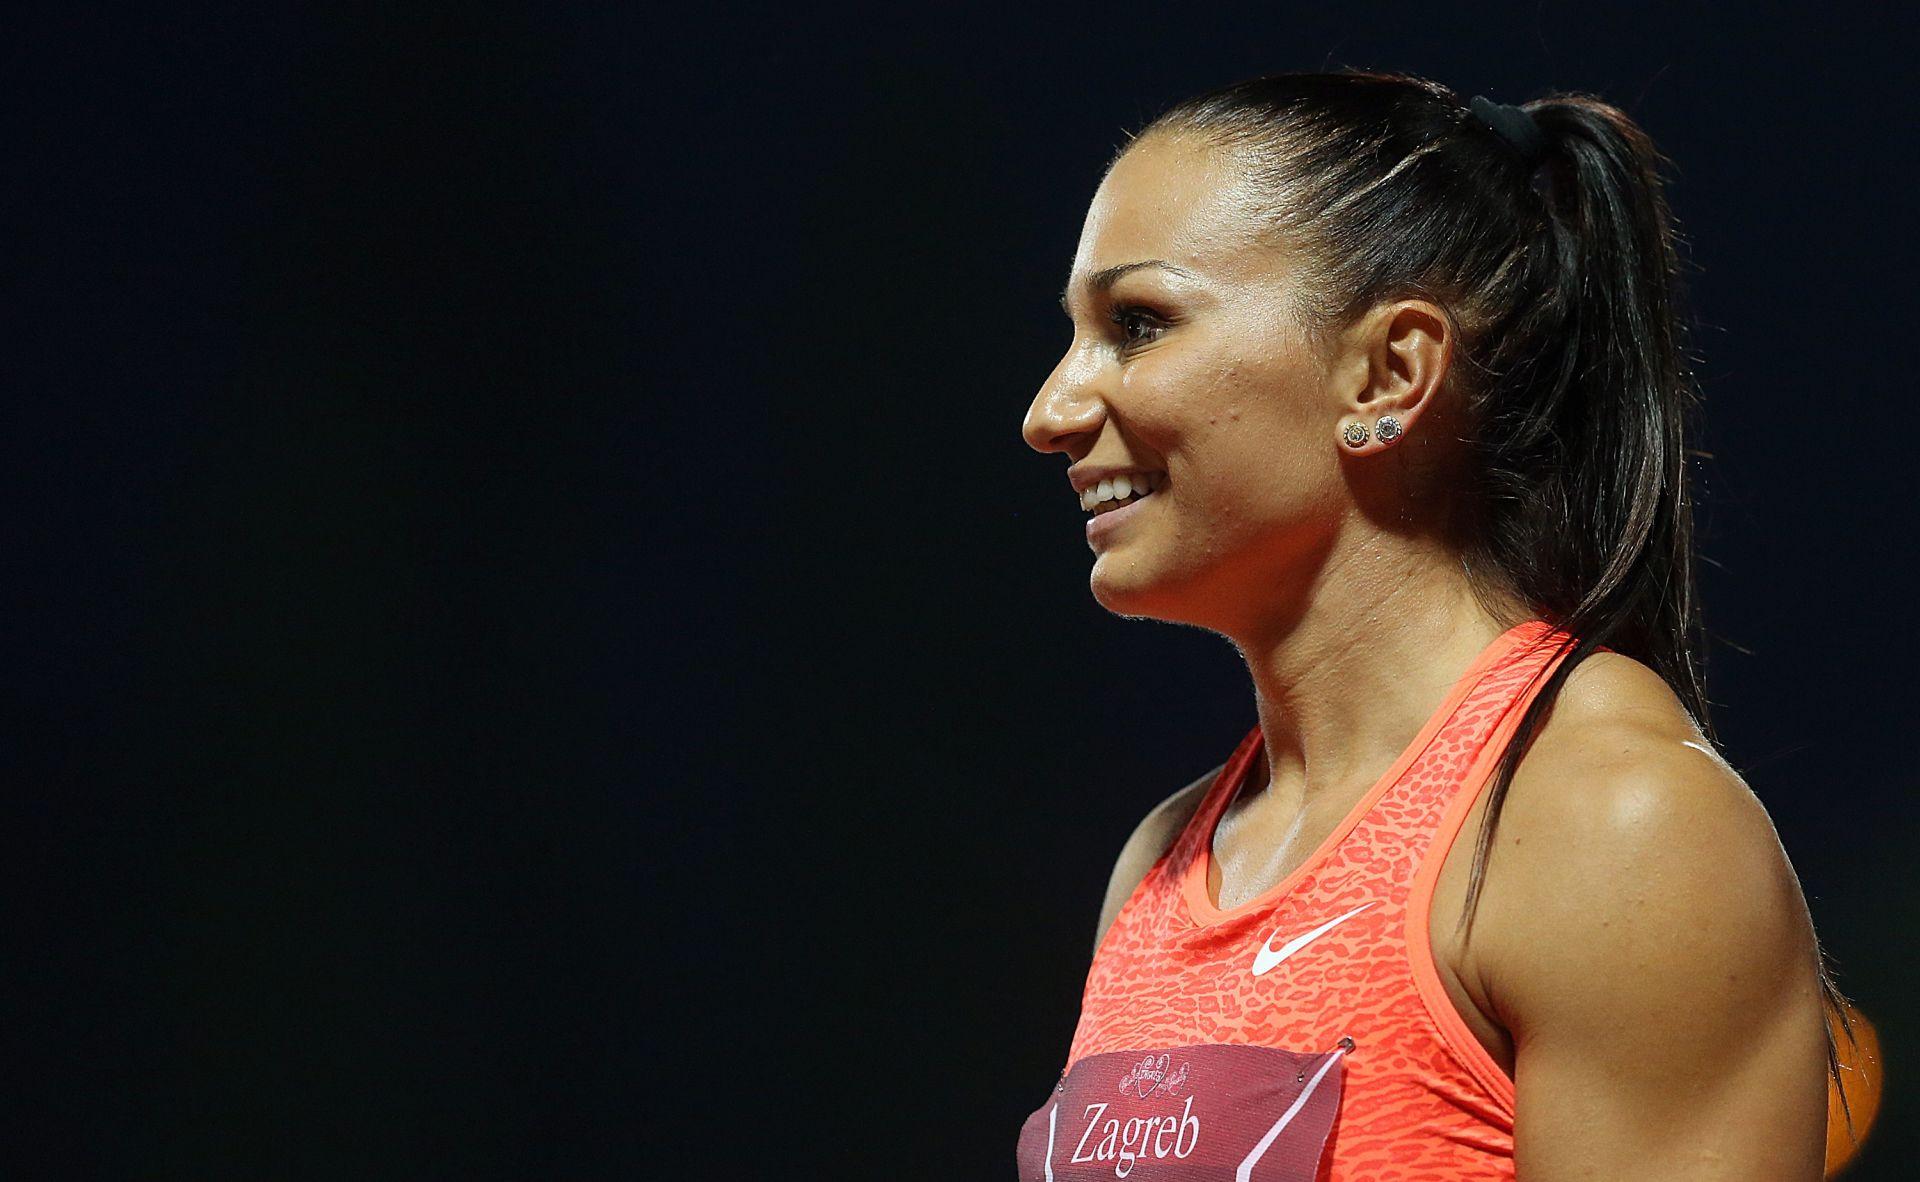 OI ATLETIKA Andrea Ivančević u polufinalu na 100 m prepone